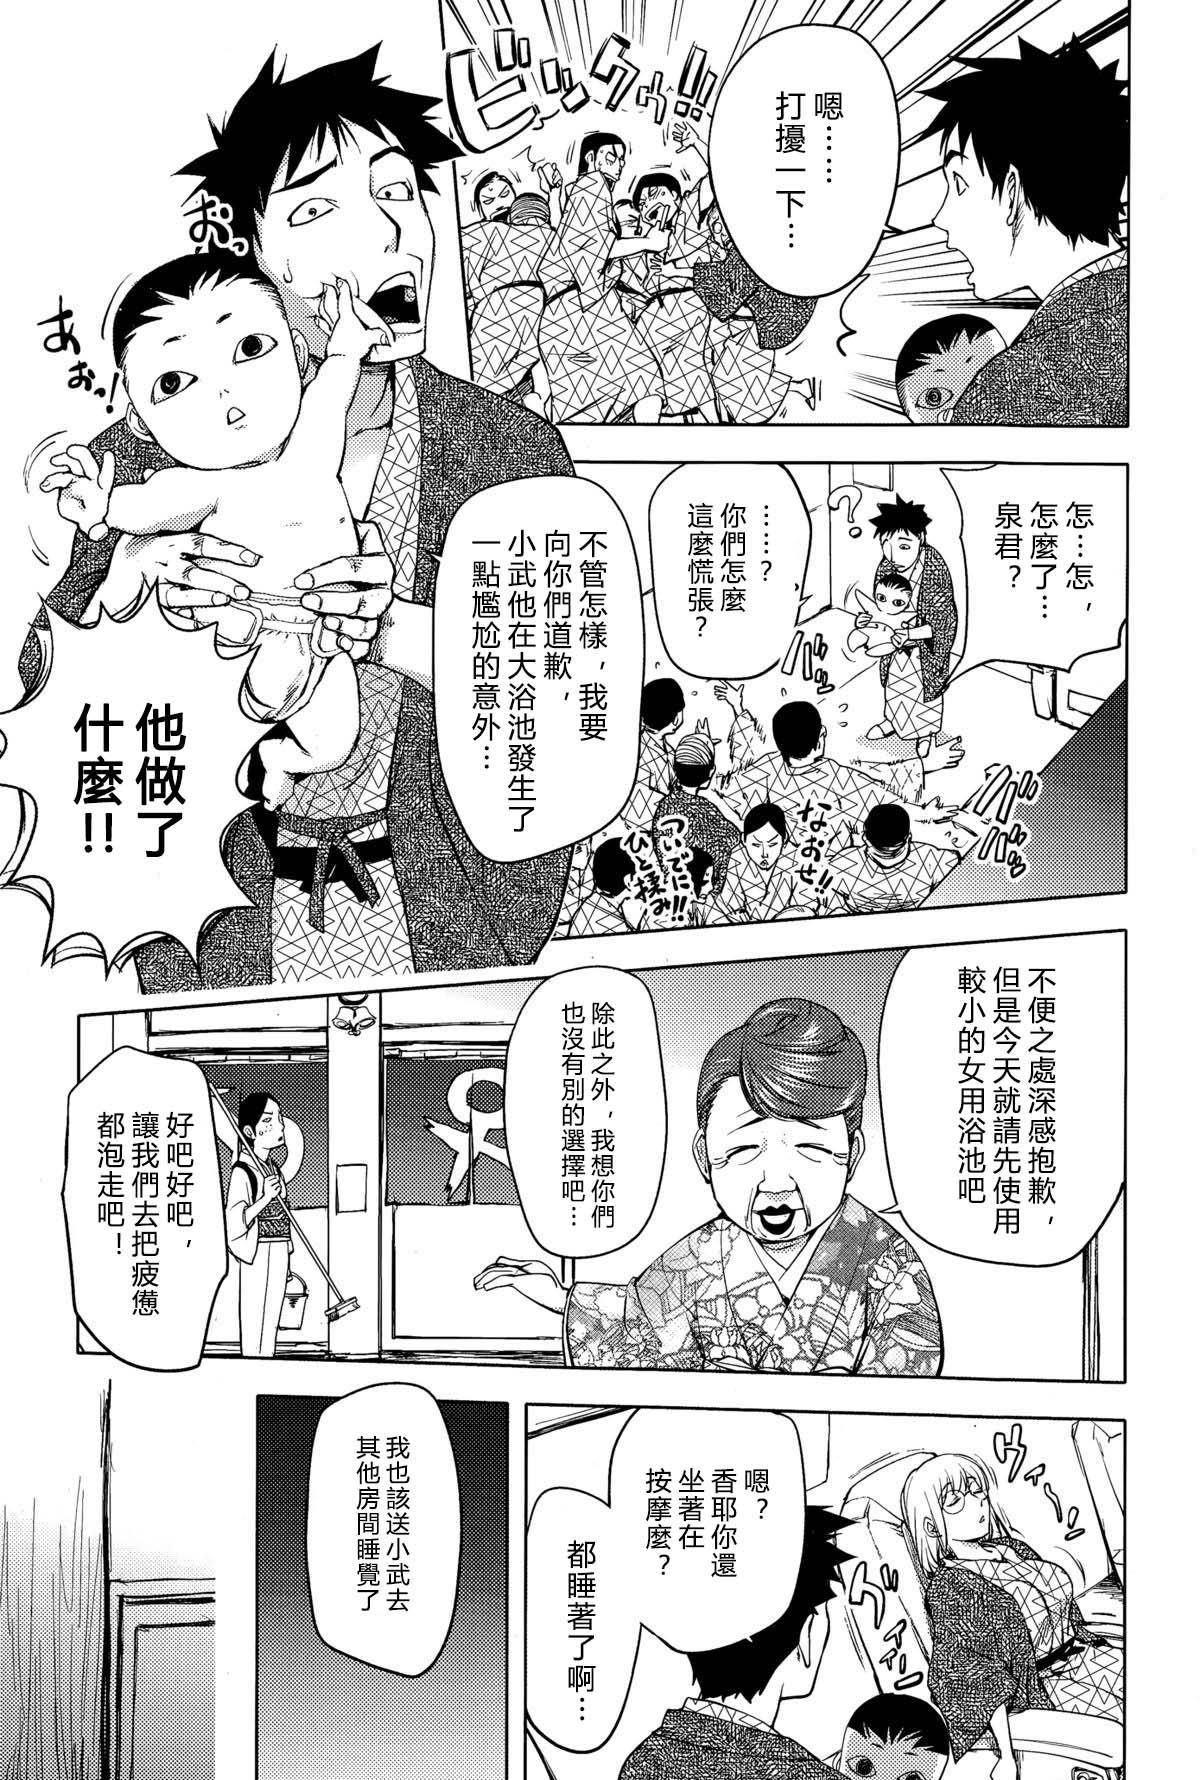 [Kon-kit] Yukemuri no Naka no Kaya-nee!   Kaya-nee At The Hotsprings (Comic Toutetsu 2015-02 Vol. 3) [Chinese] [蒟吉人個人漢化] 4